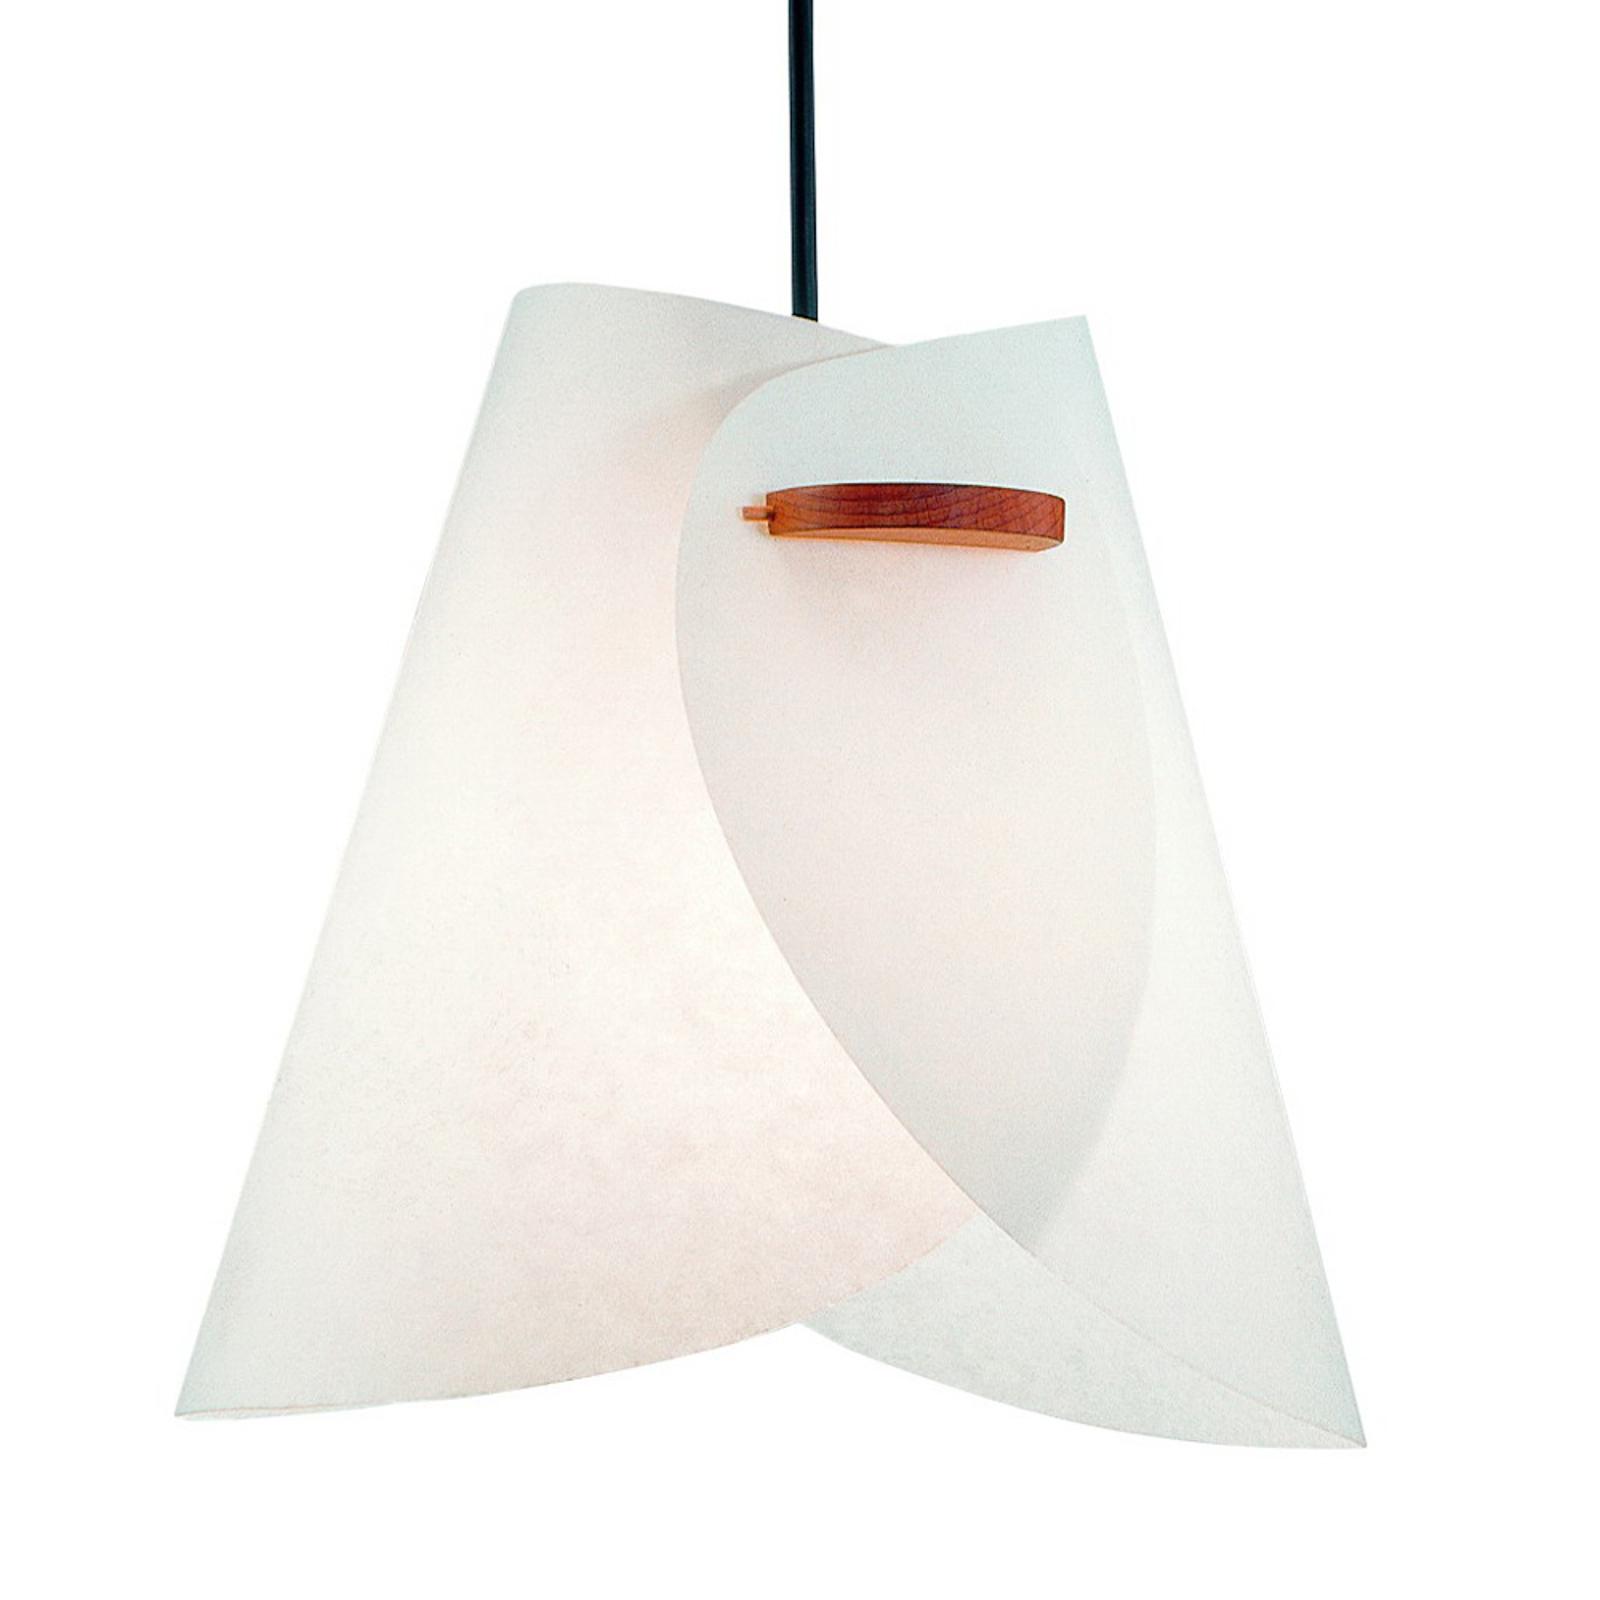 Biela dizajnérska závesná lampa IRIS_2600151_1